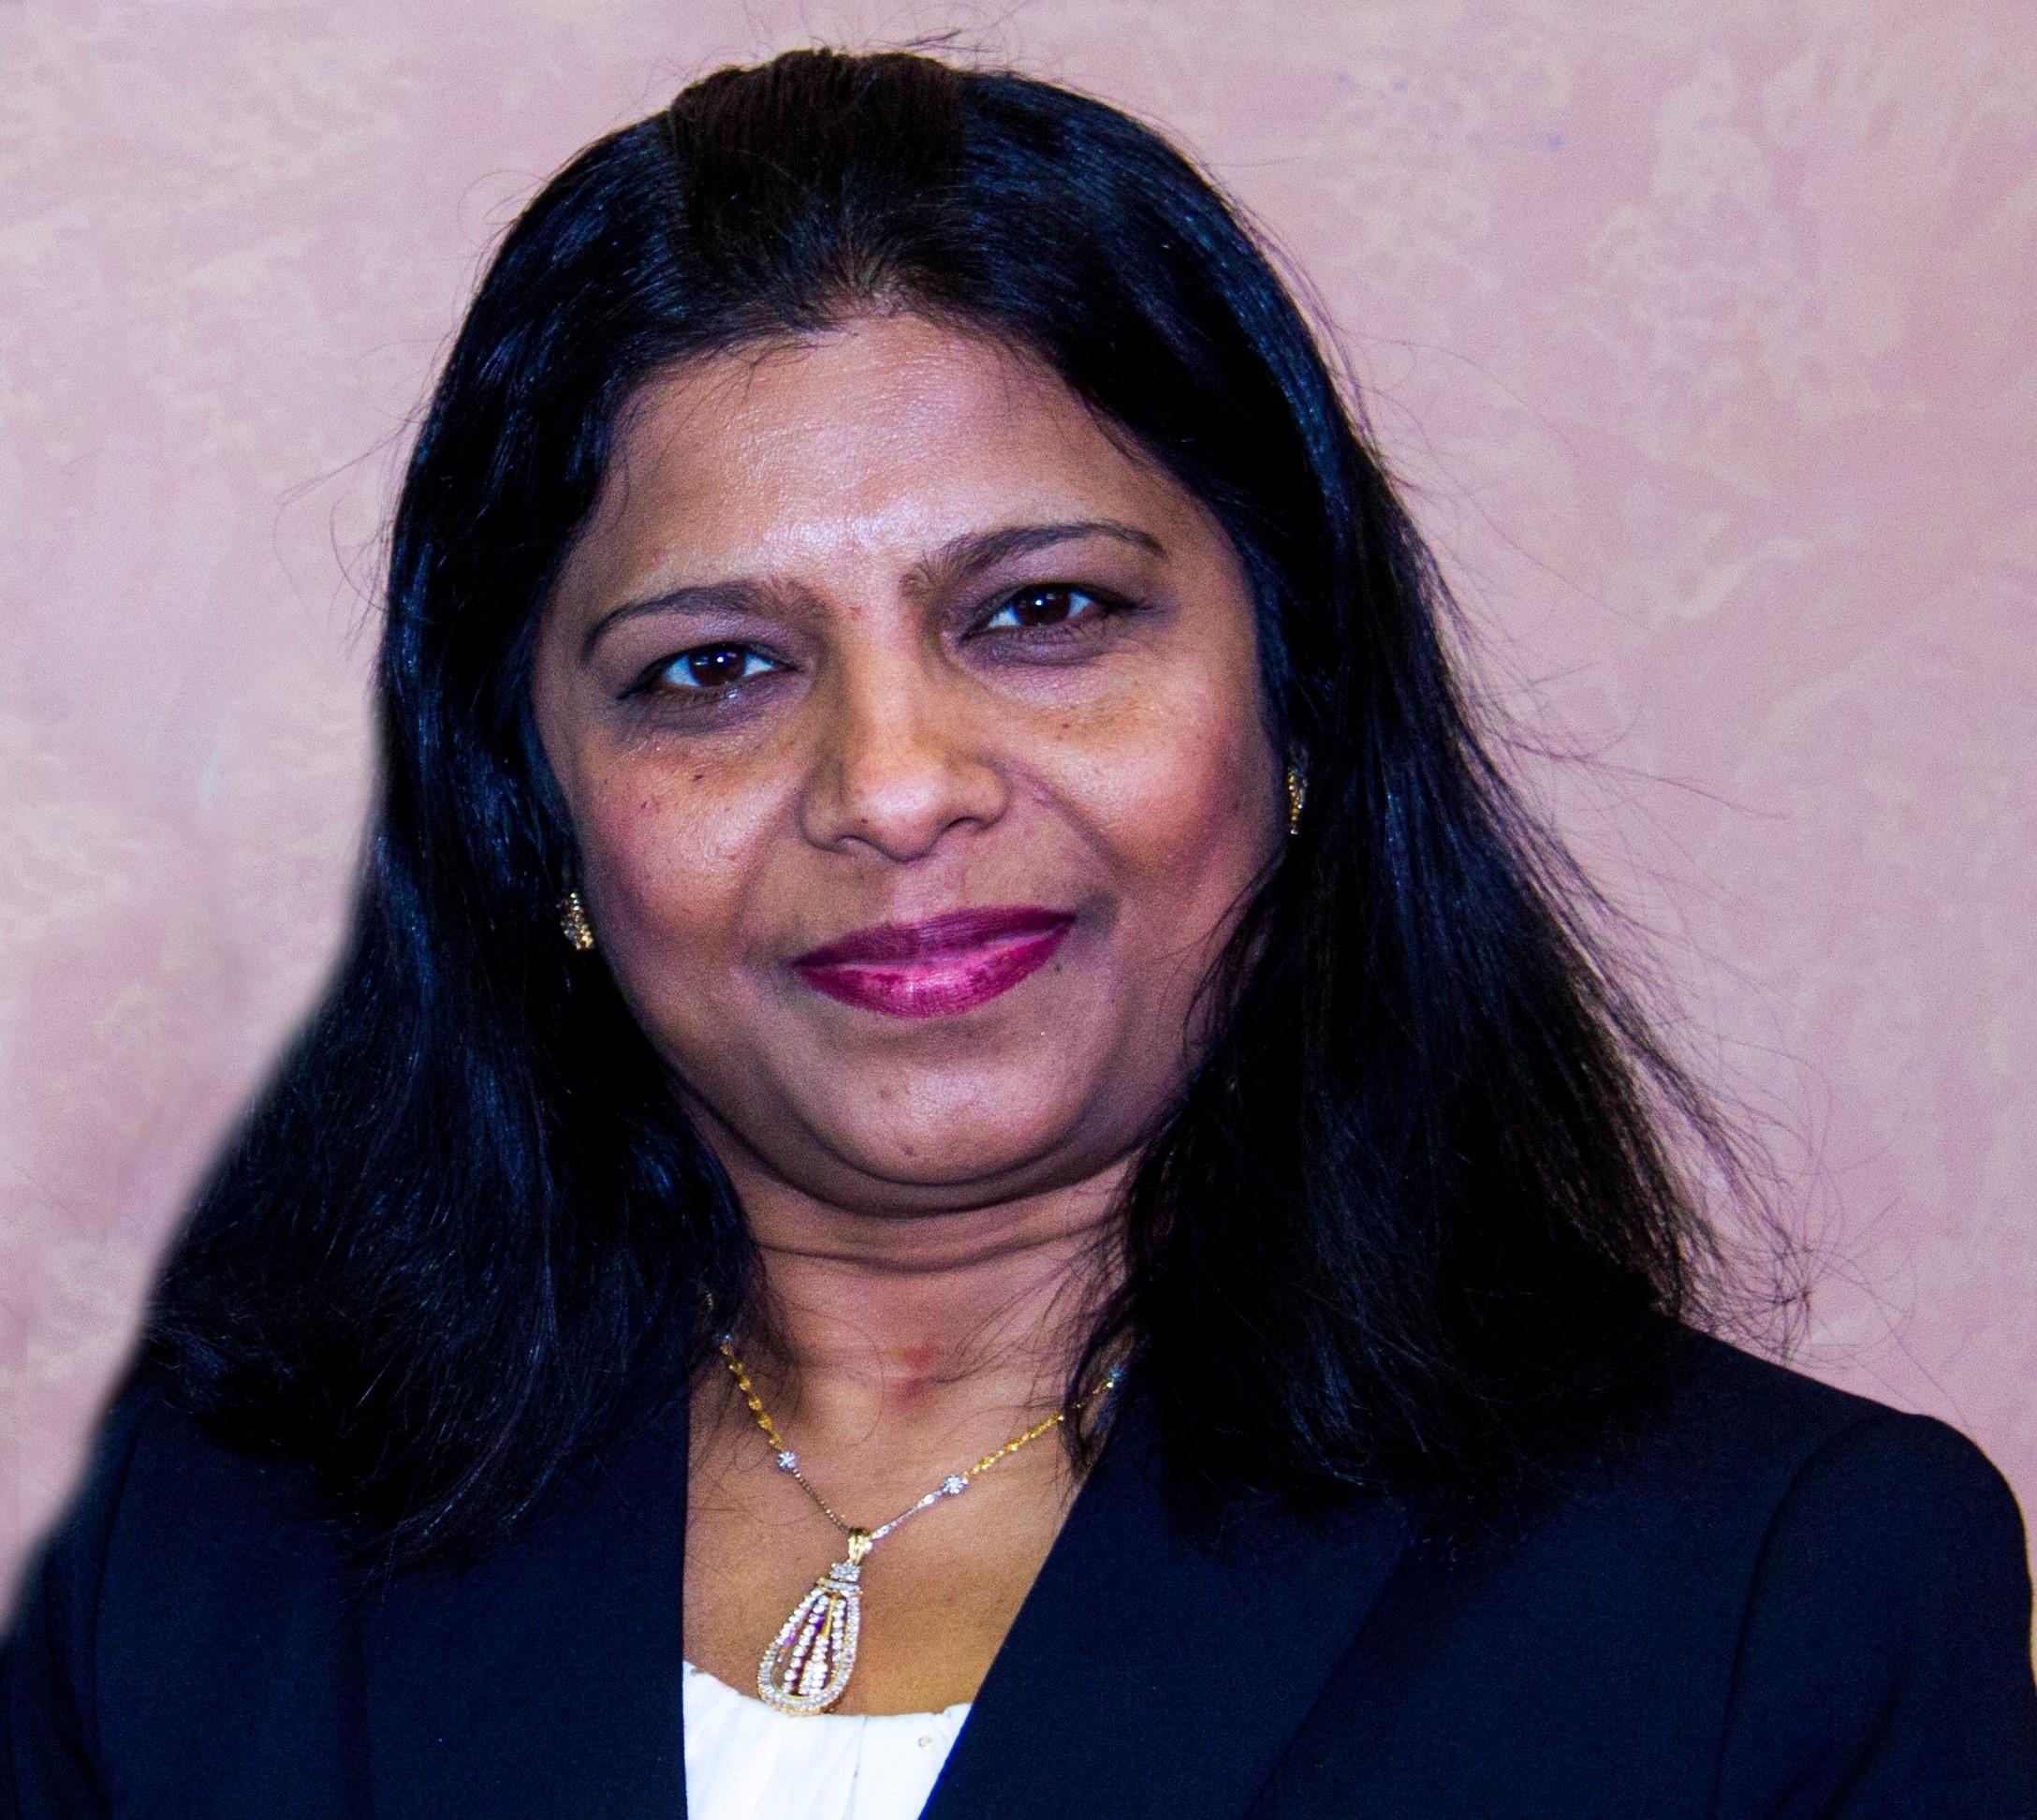 Speaker at Nursing research conferences- Malliga Jambulingam